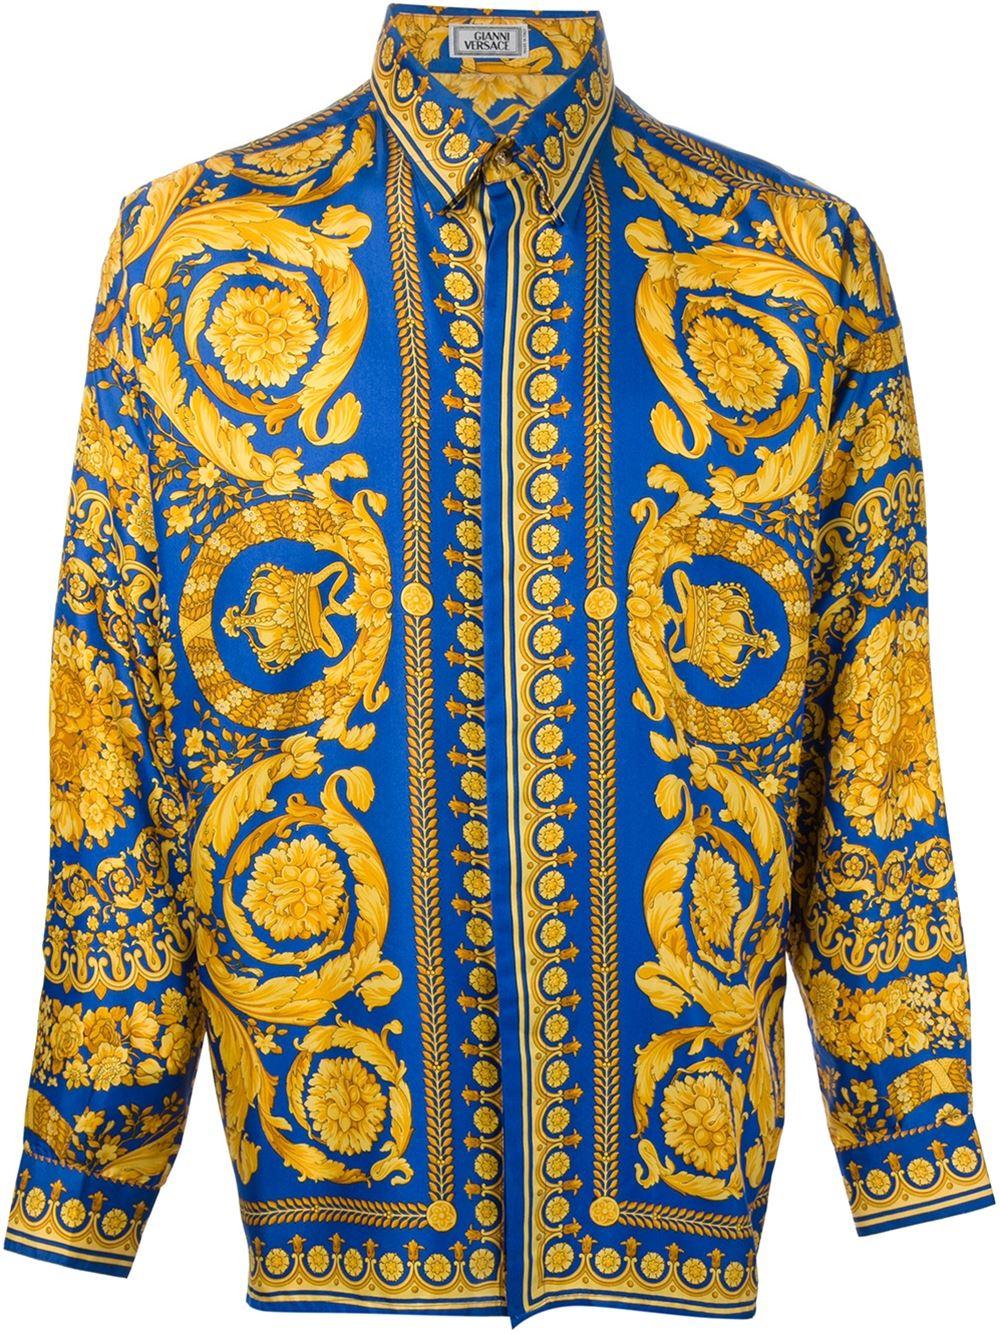 Versace Baroque Print Shirt in Yellow | Lyst